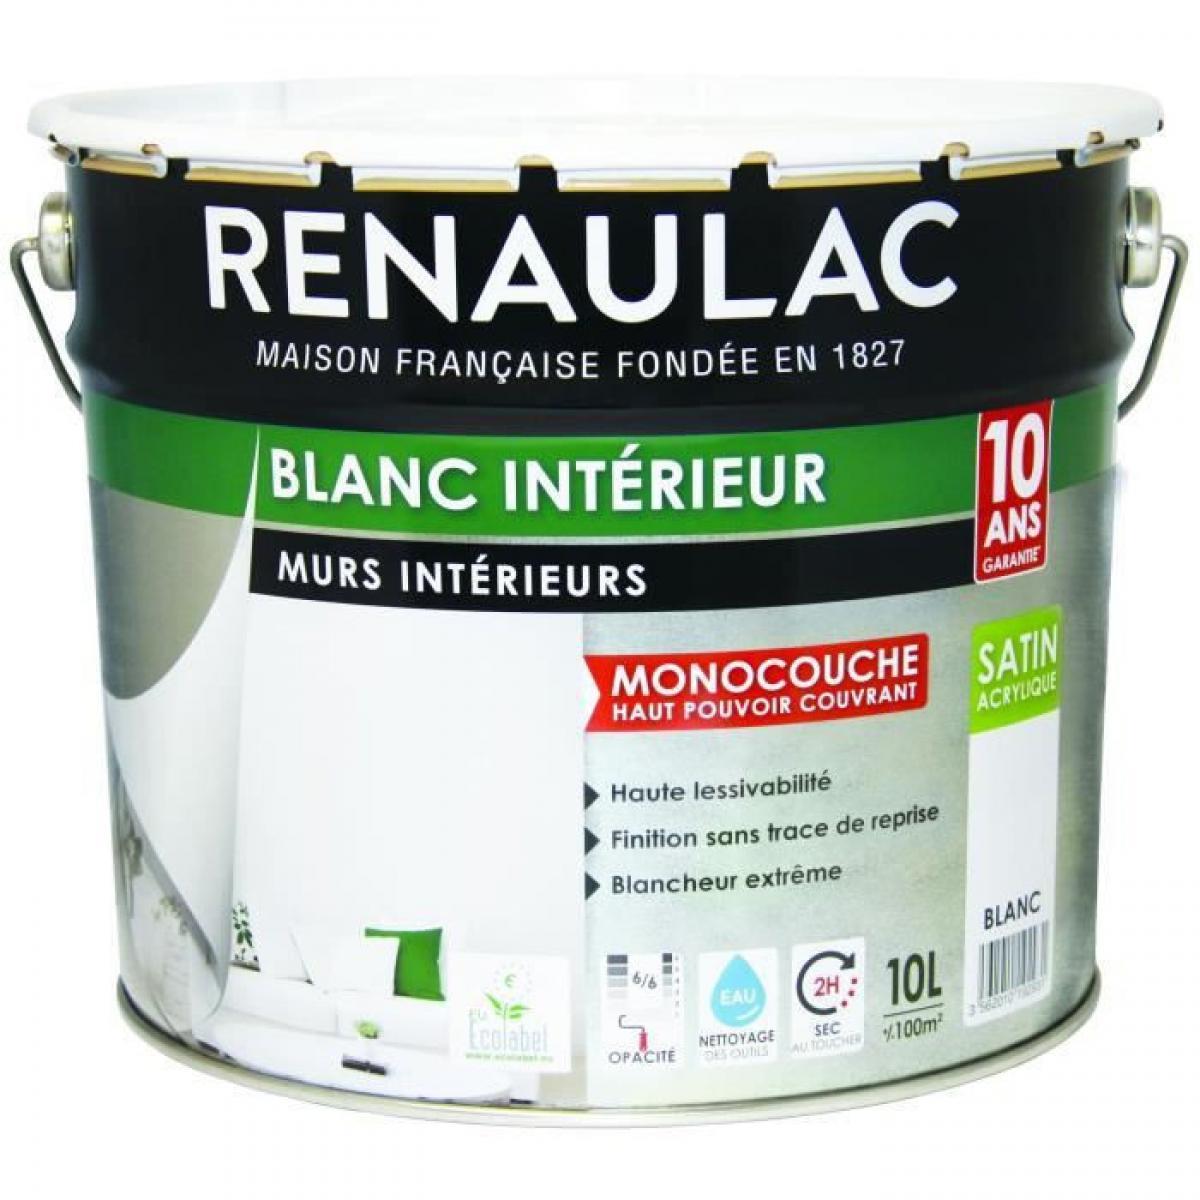 Renaulac Peinture murale monocouche acrylique 10 L satin blanc extreme - RENAULAC